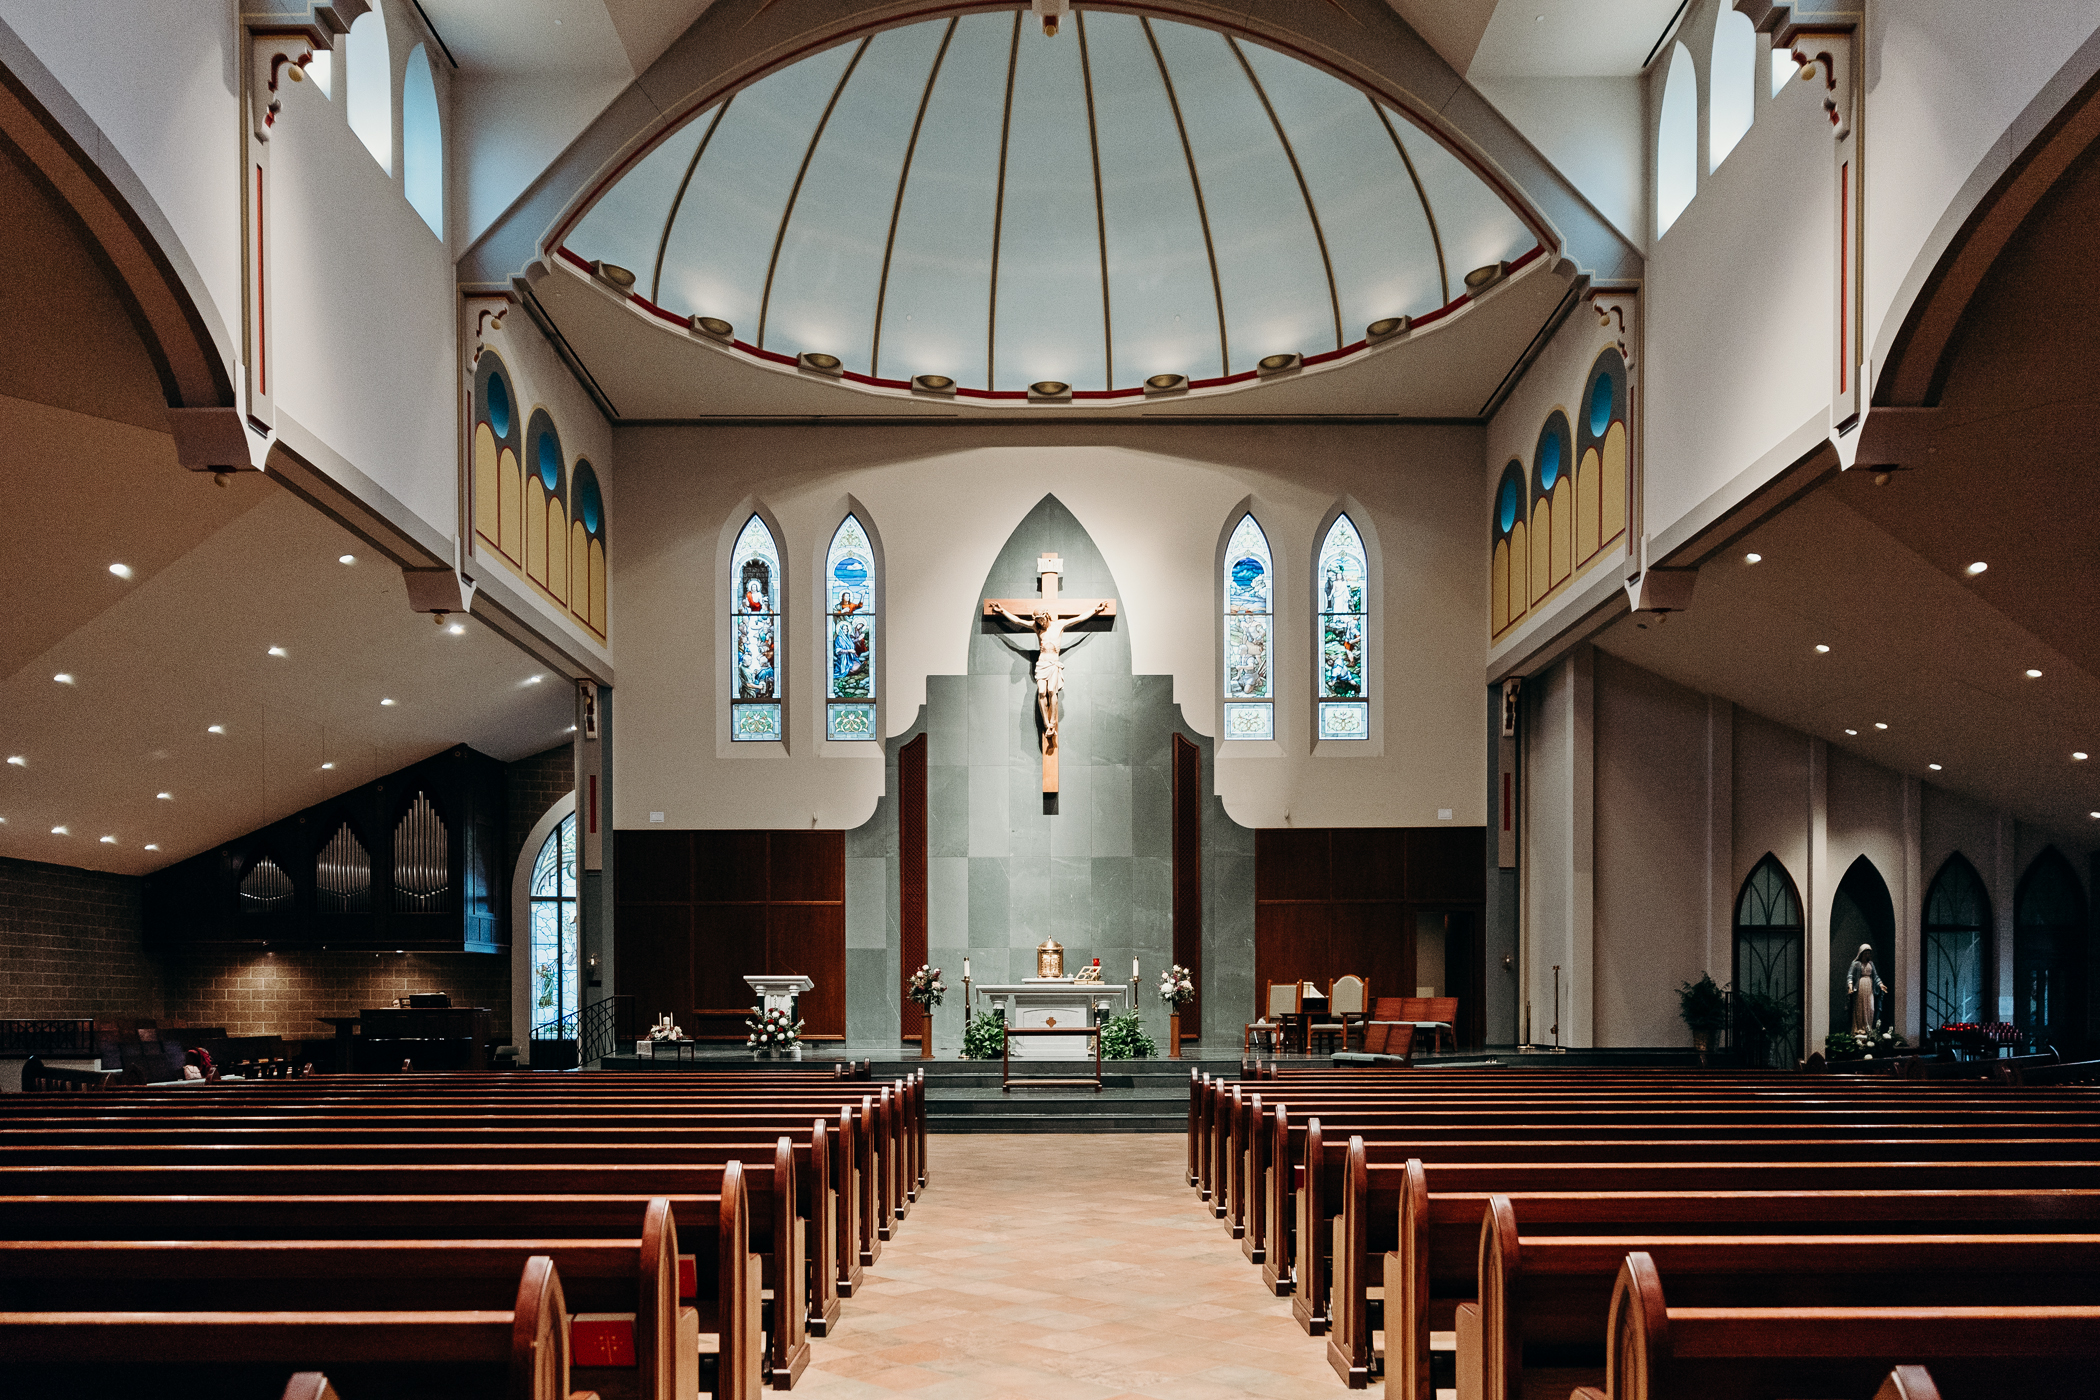 Interior view of St. Michael Catholic Church in Wheaton, IL